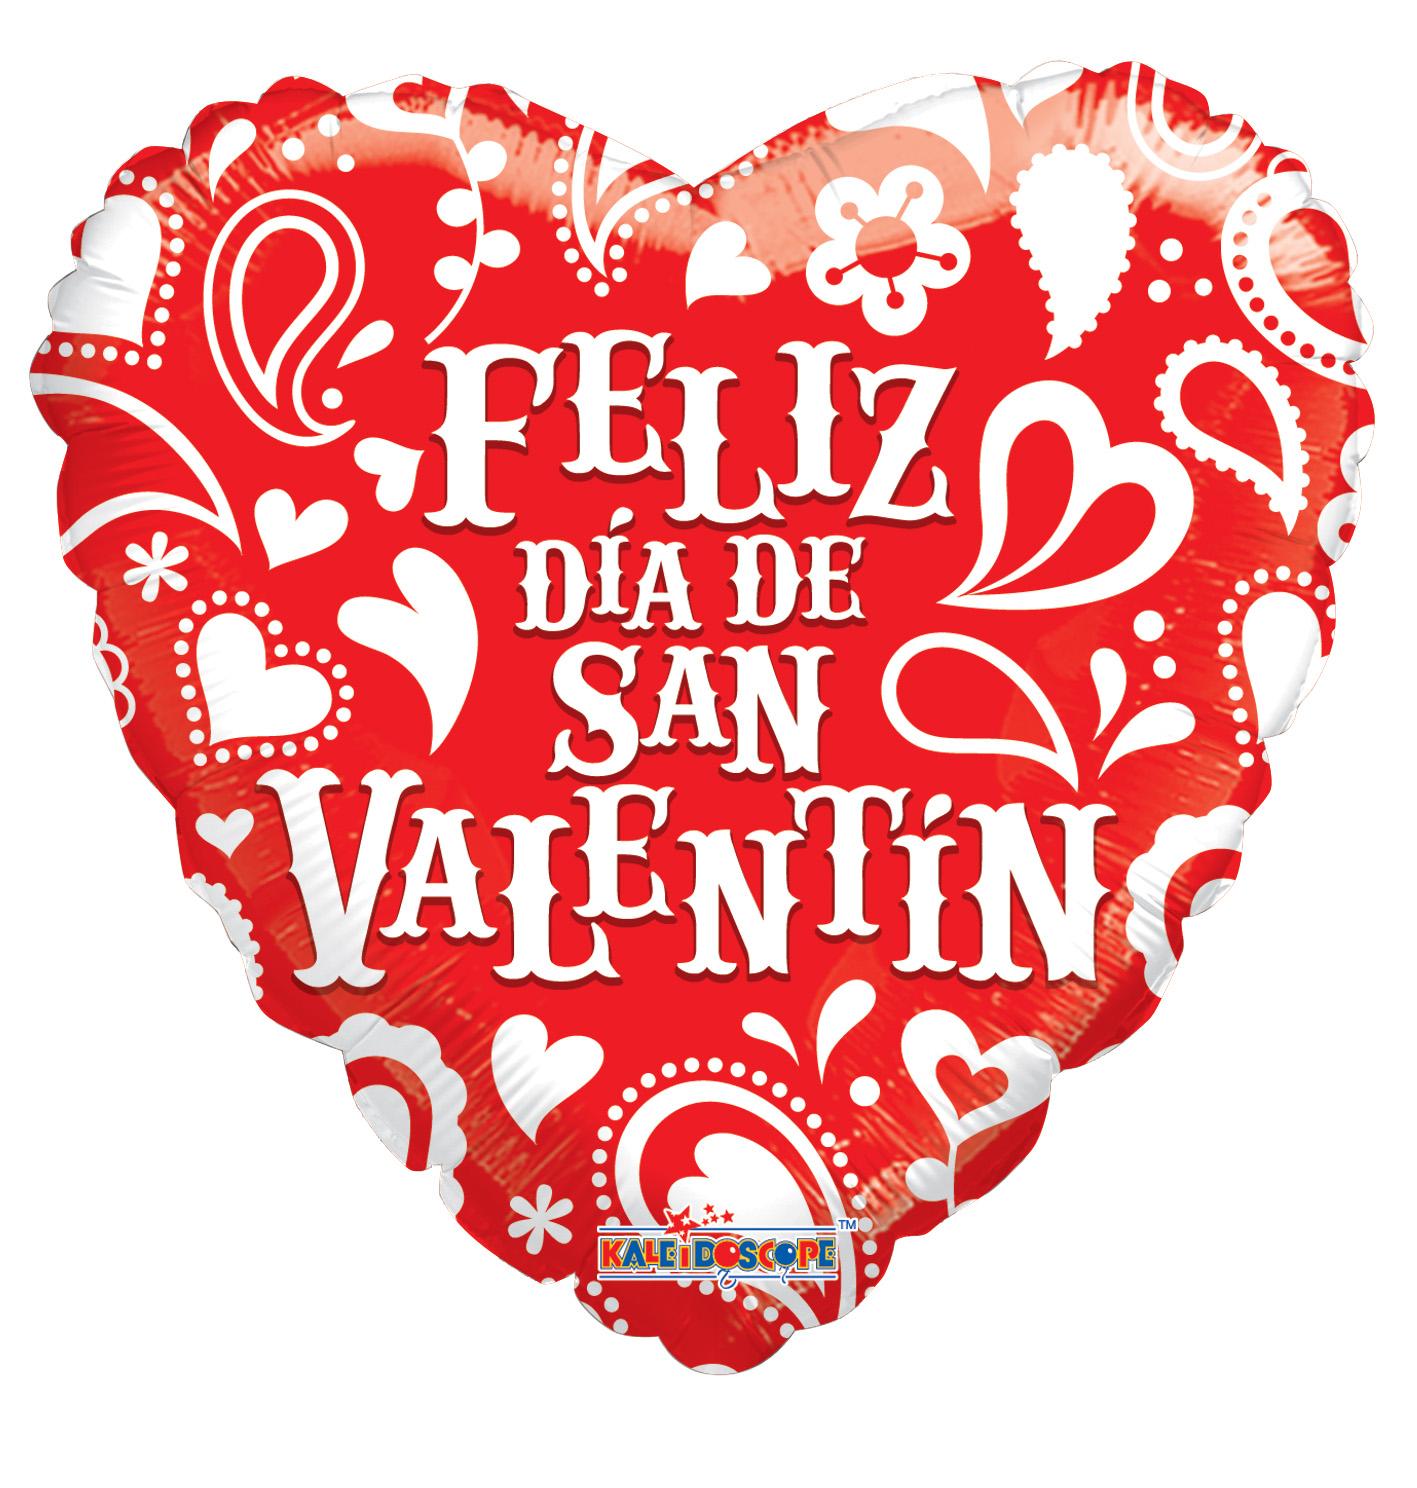 Im genes de san valentin tarjetas con frases de amor para - Postales dia de san valentin ...